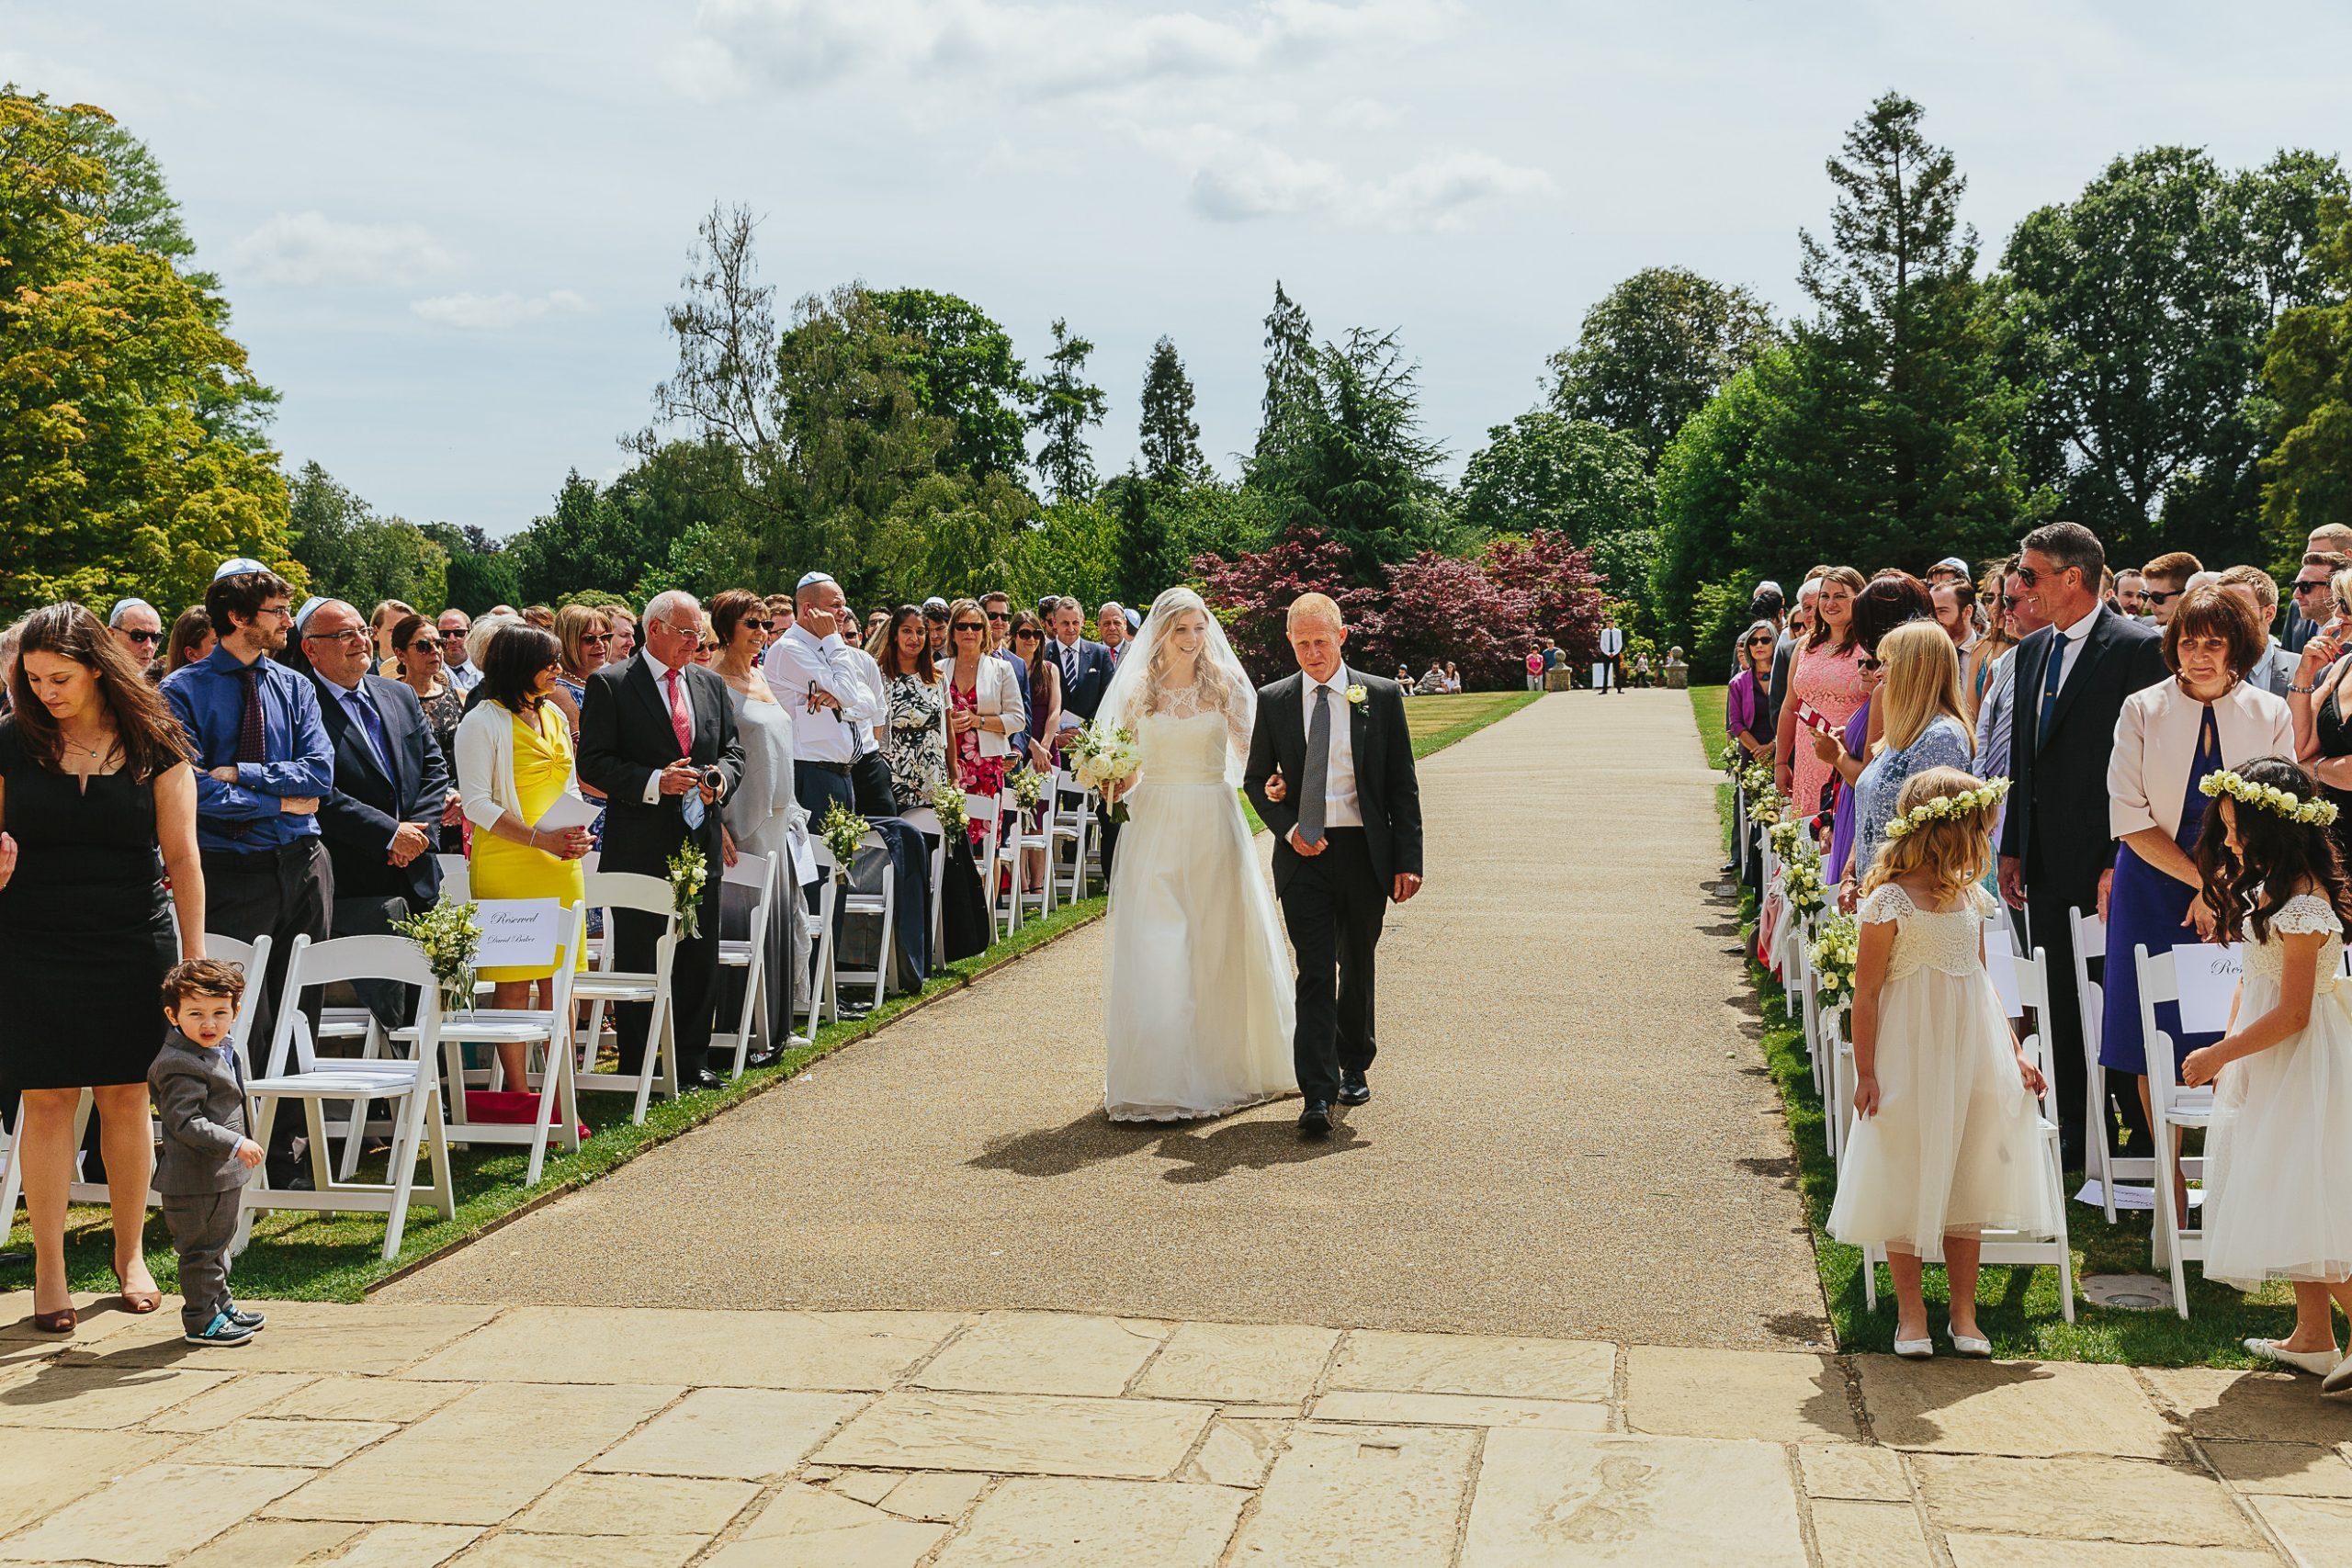 Wakehurst Place wedding - Kate & Darren